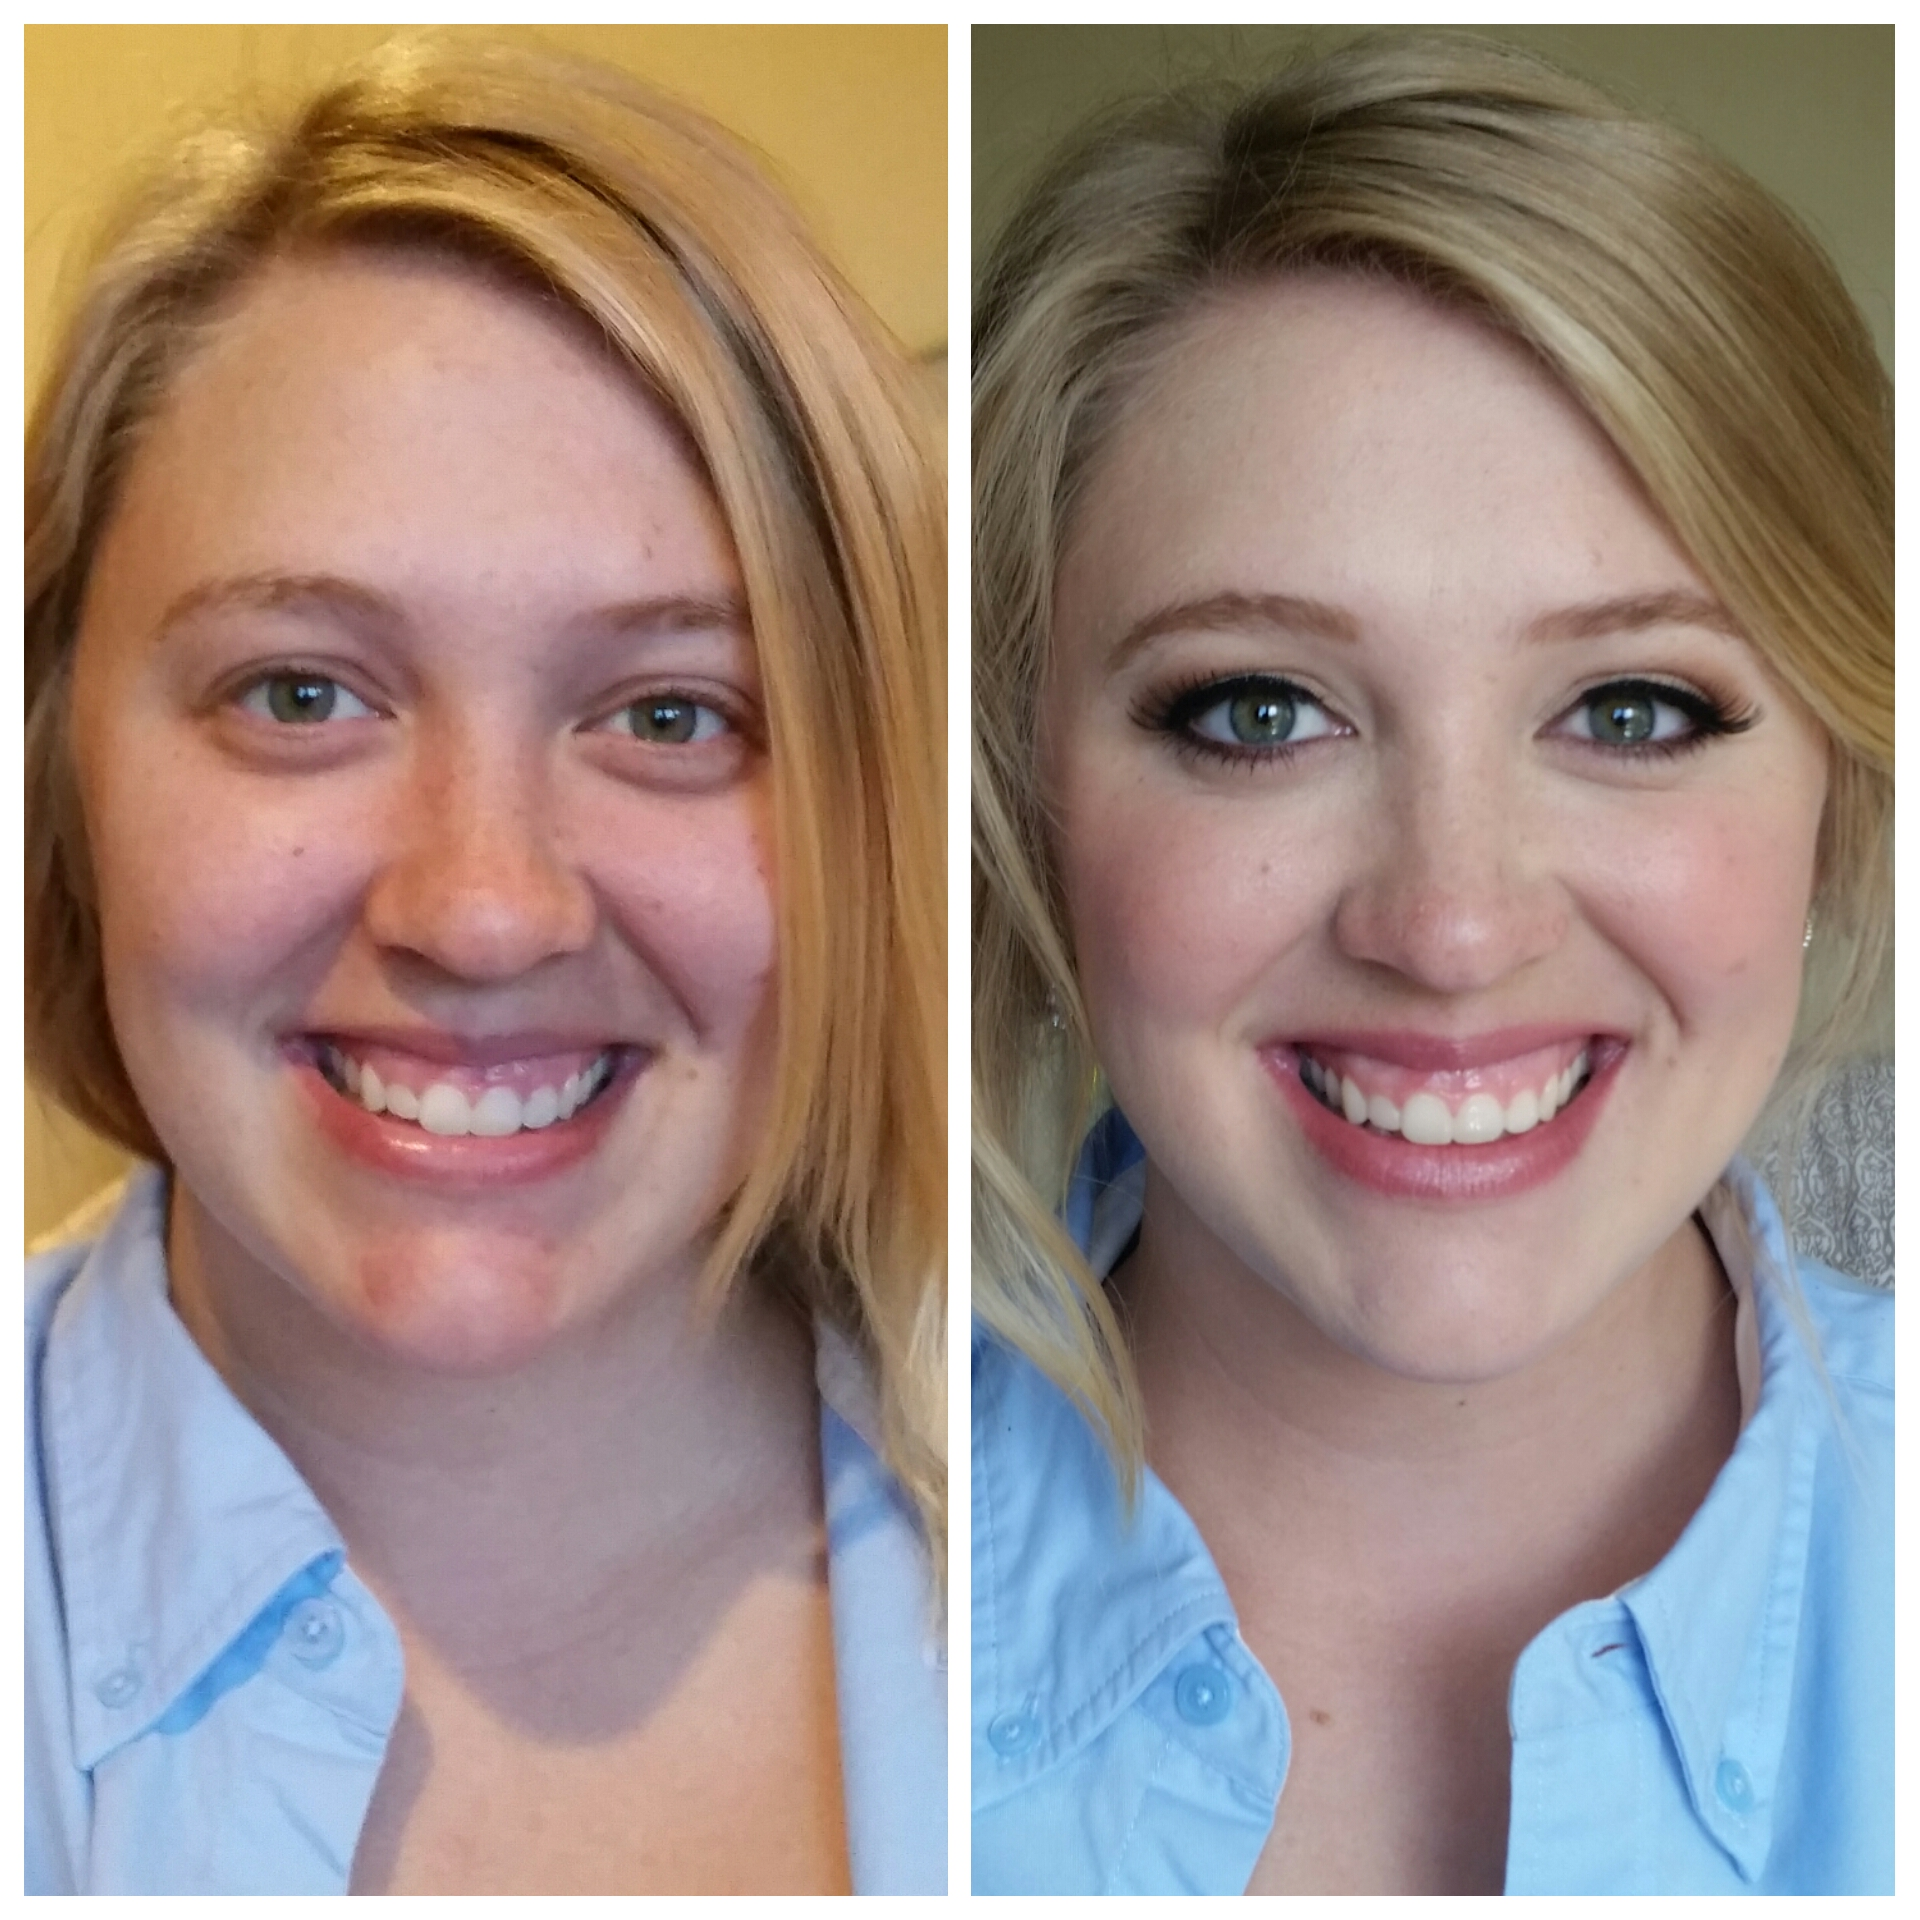 Airbrush Makeup Artist Sophisticated Makeup Application.jpg